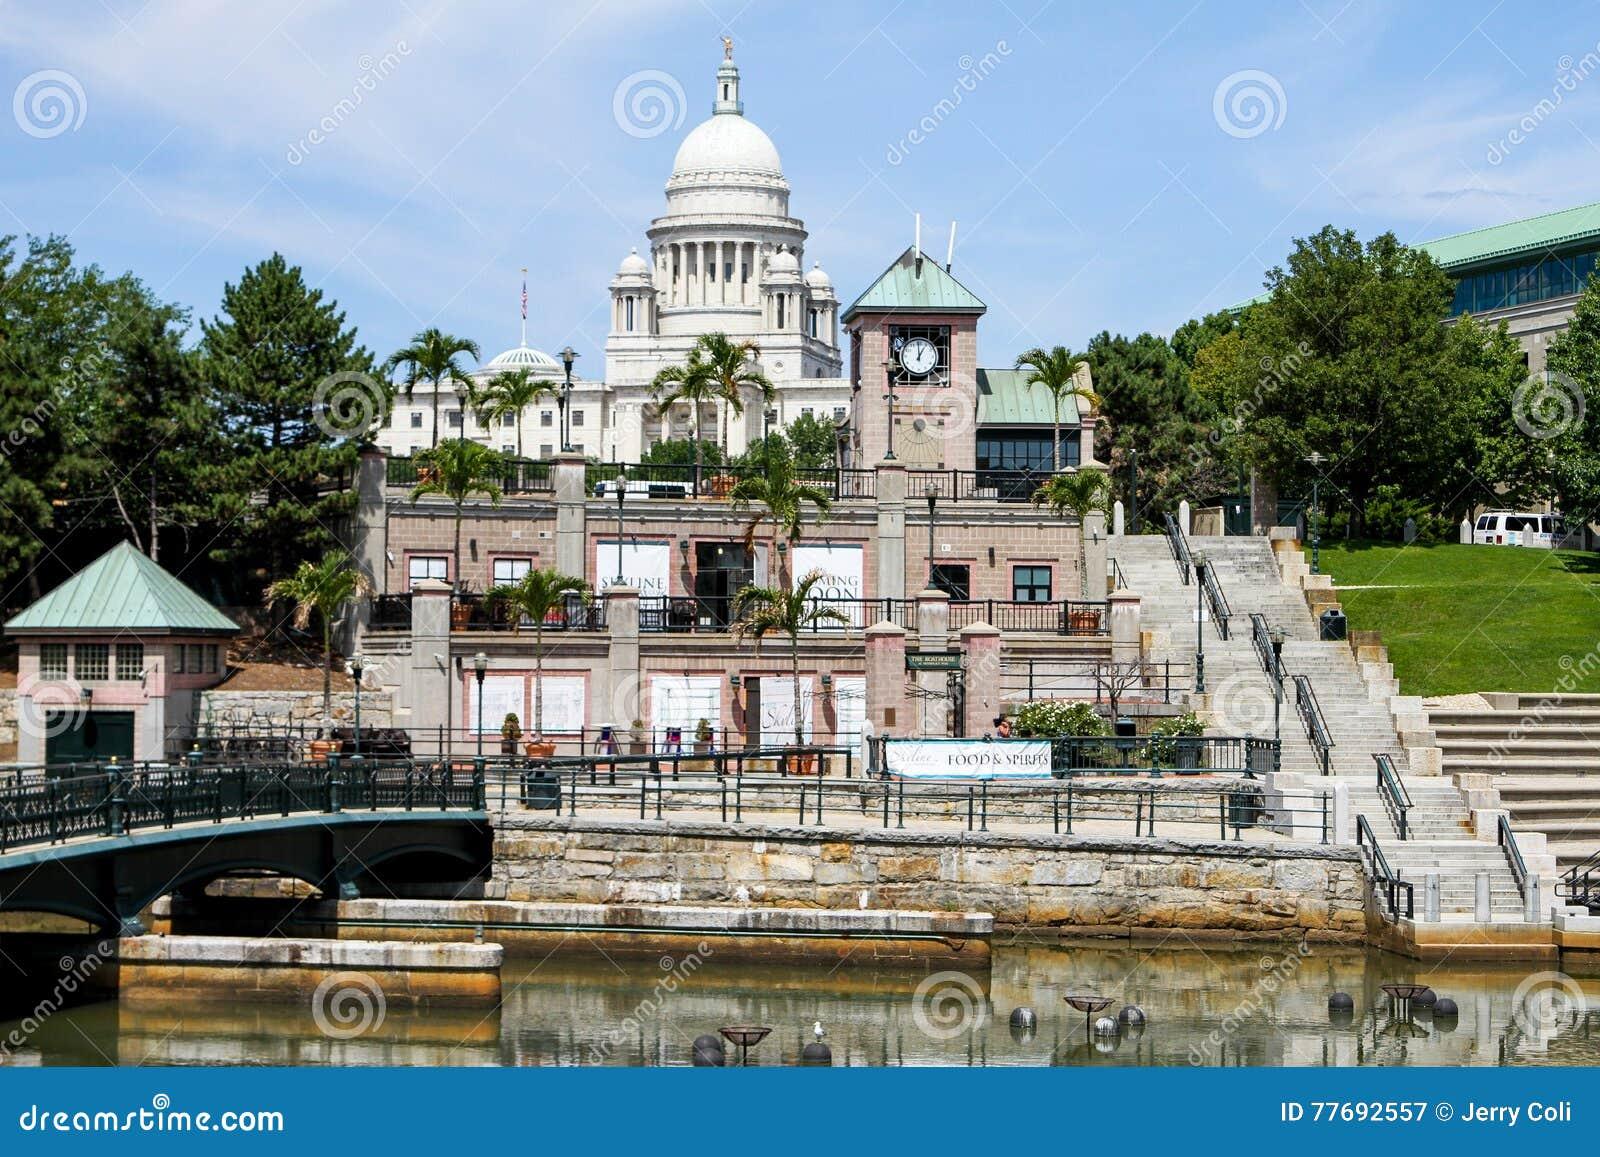 Waterplace Park, Providence, RI